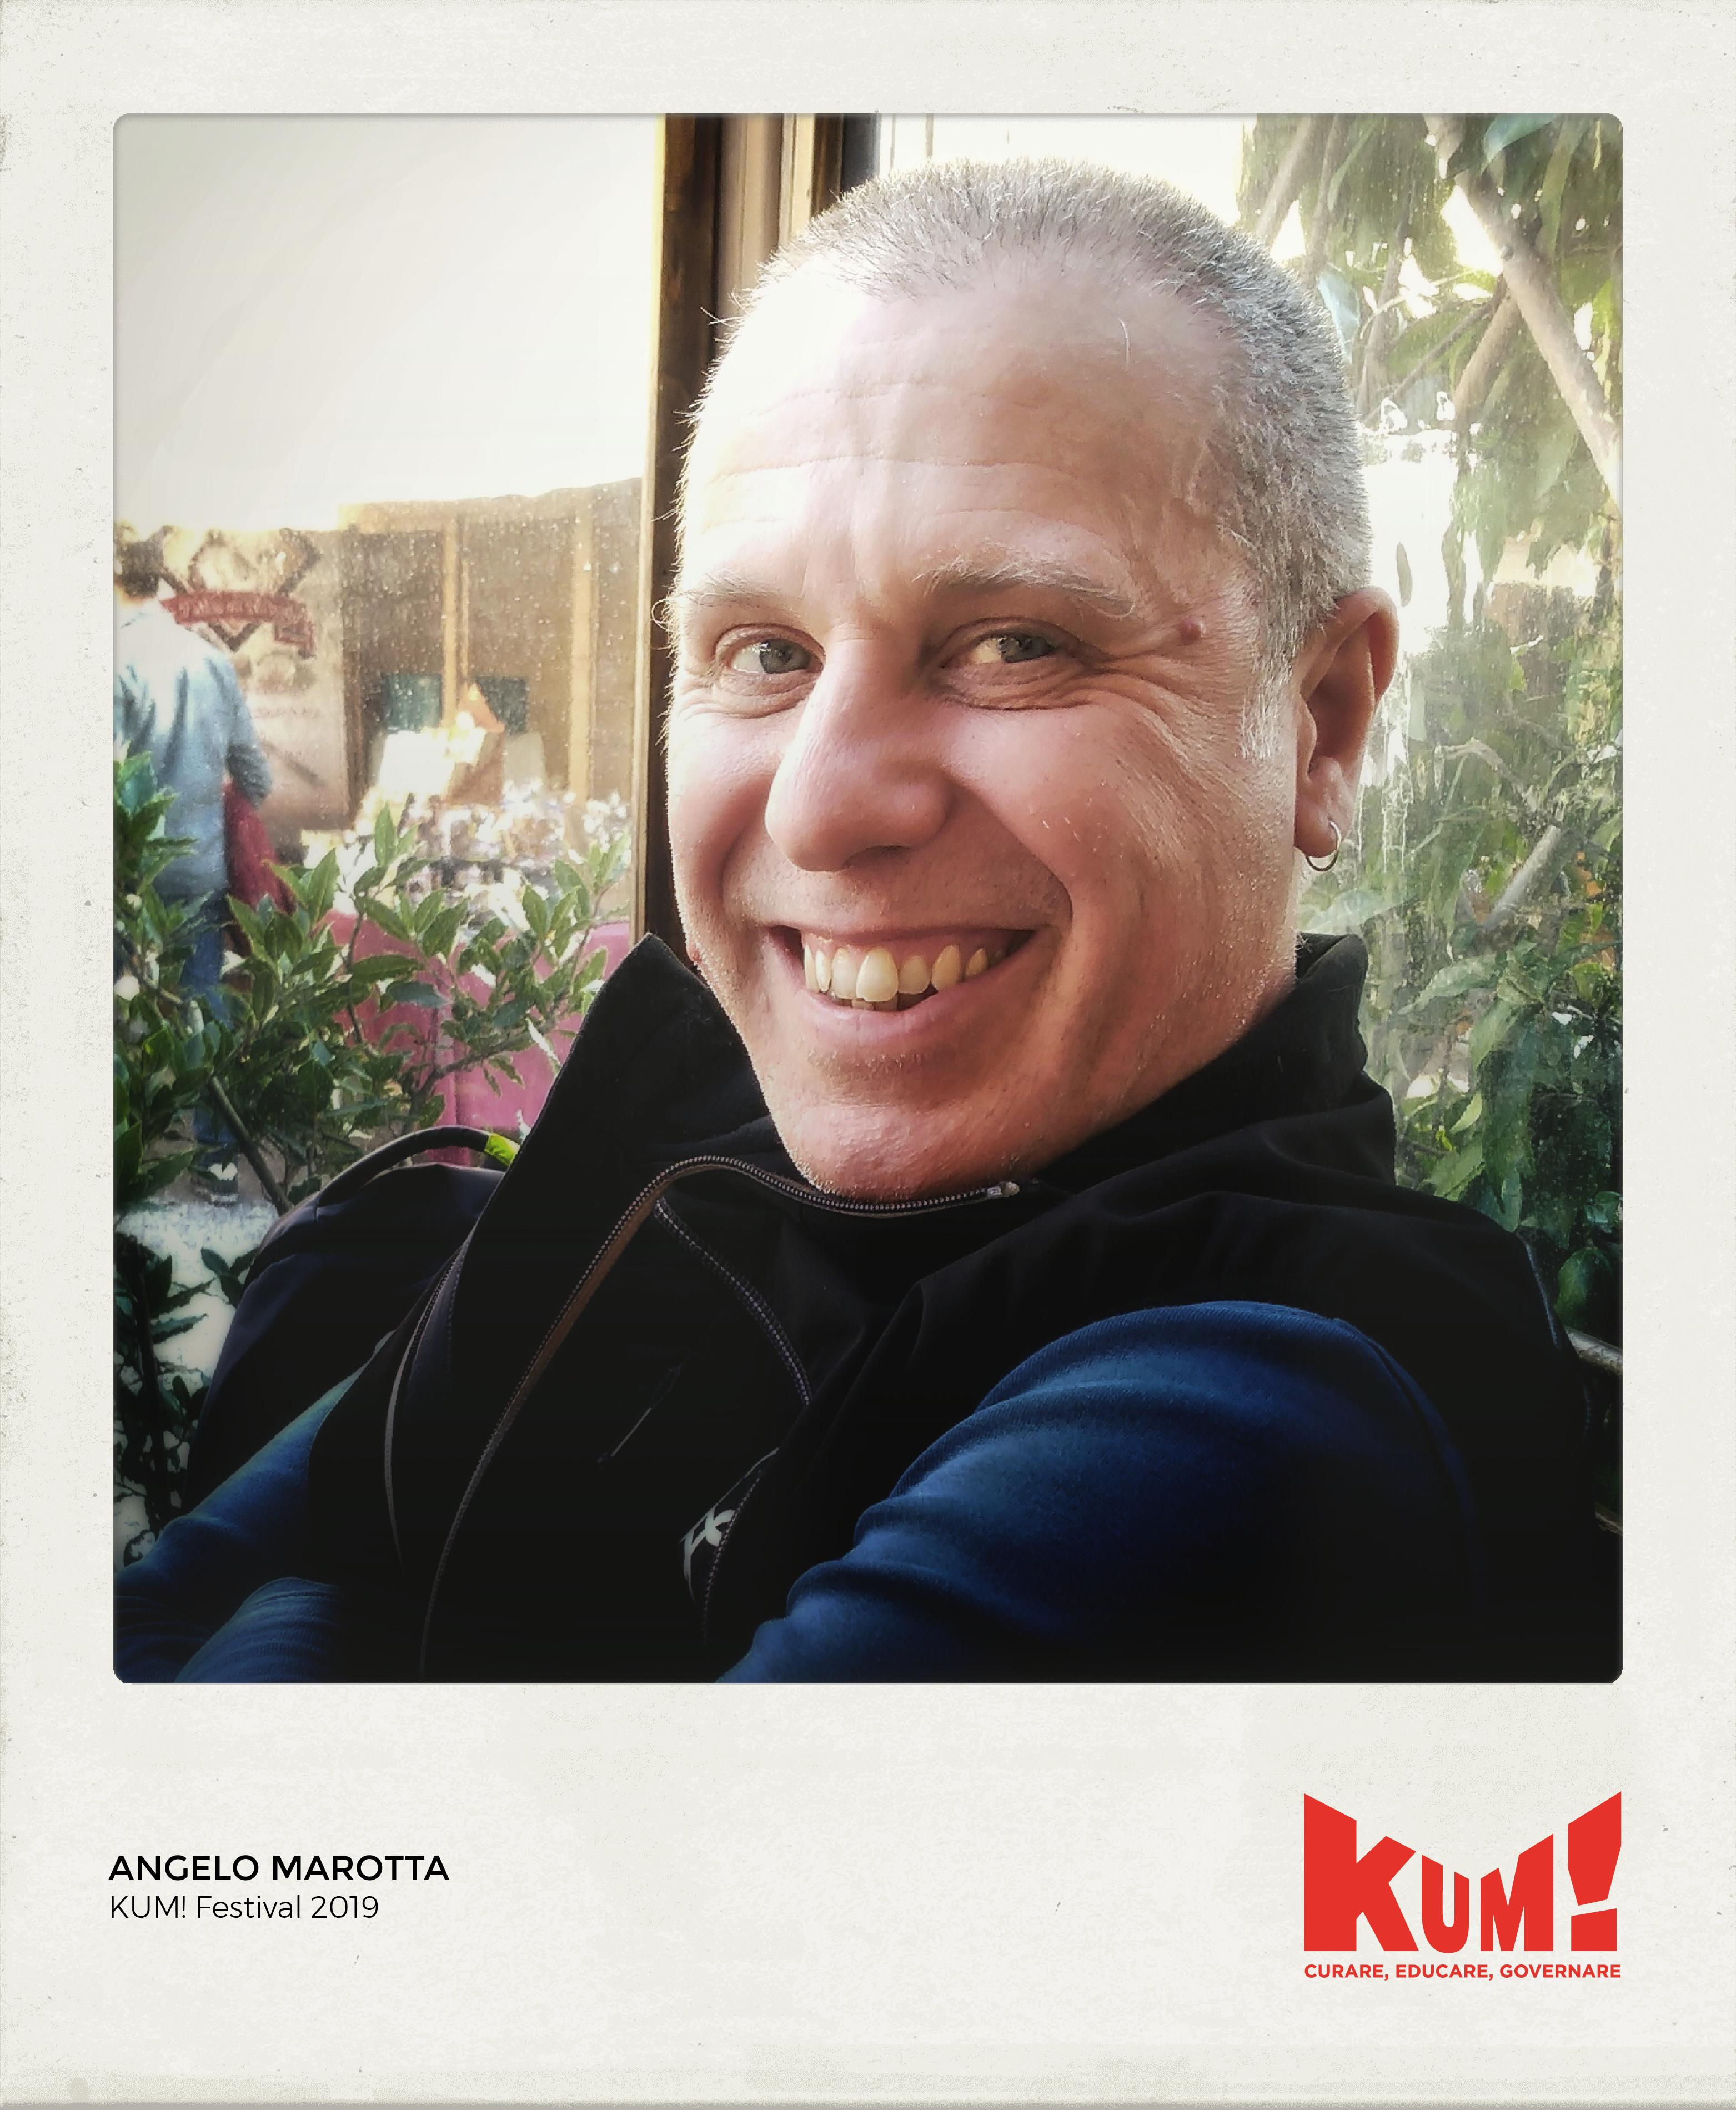 Angelo Marotta